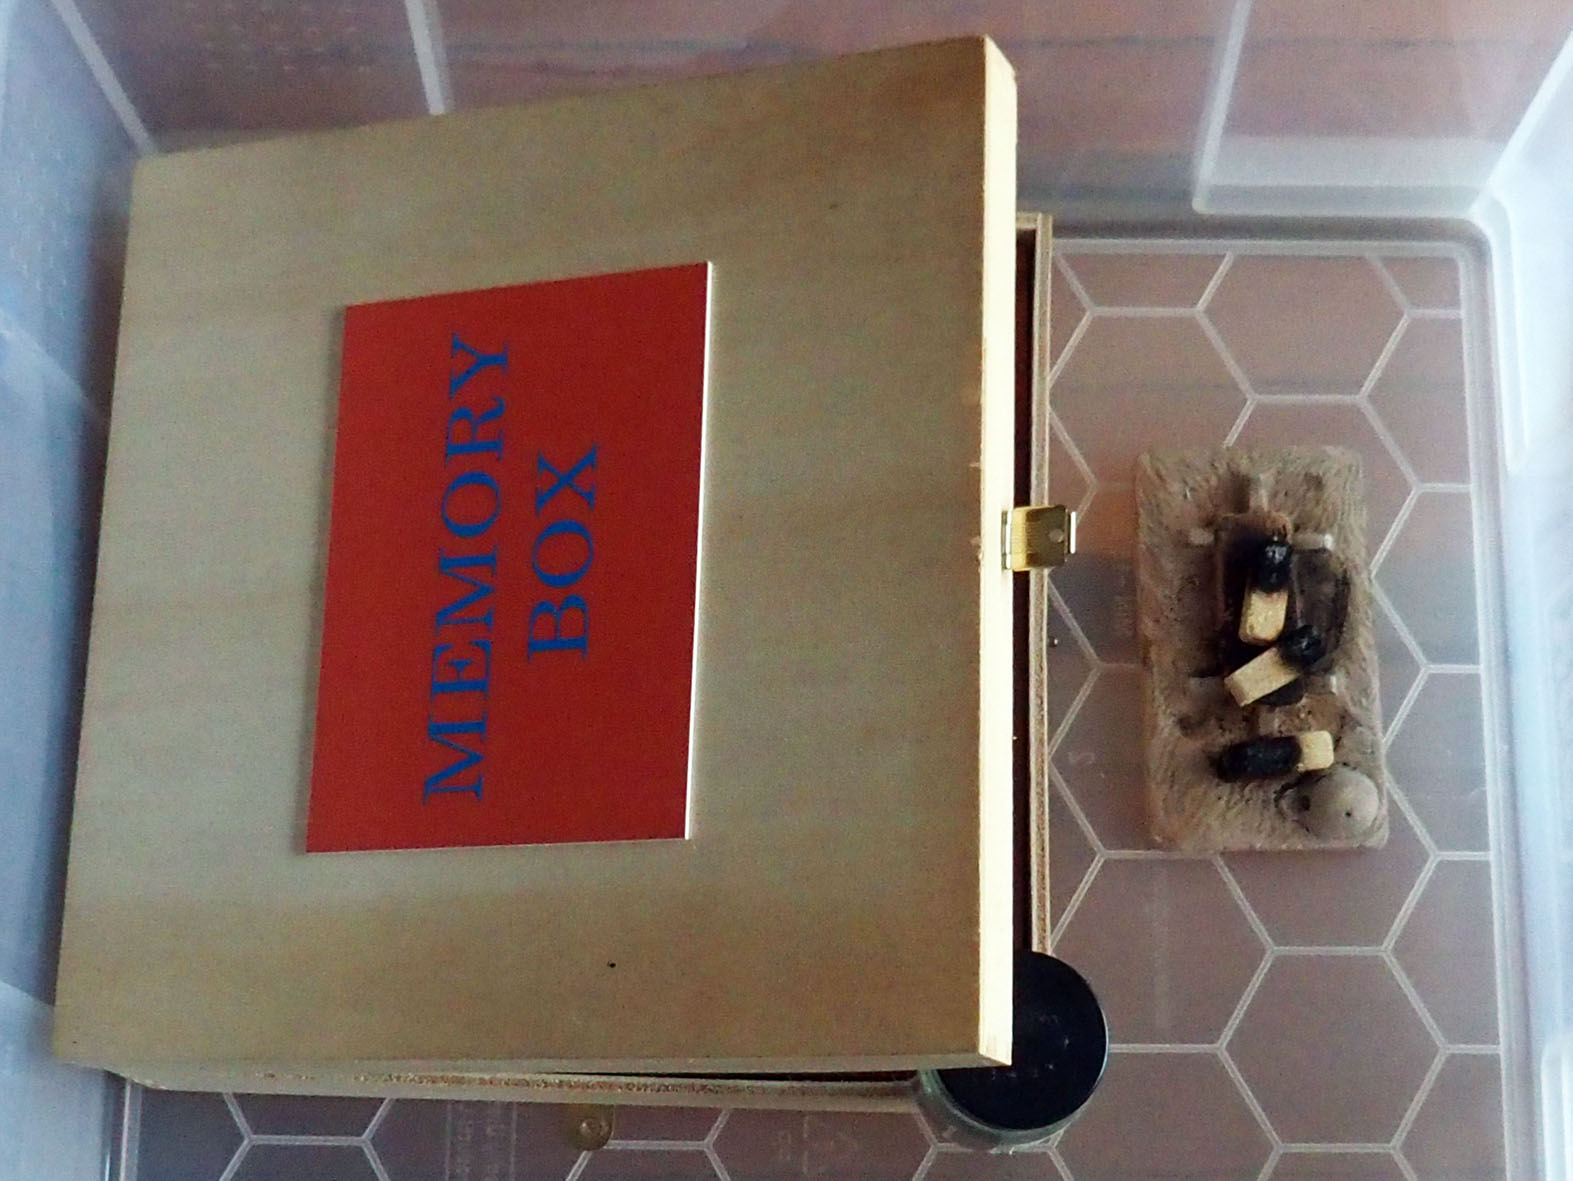 8-Memory-Box-Smoking-the-box-with-pinon-incense.jpg